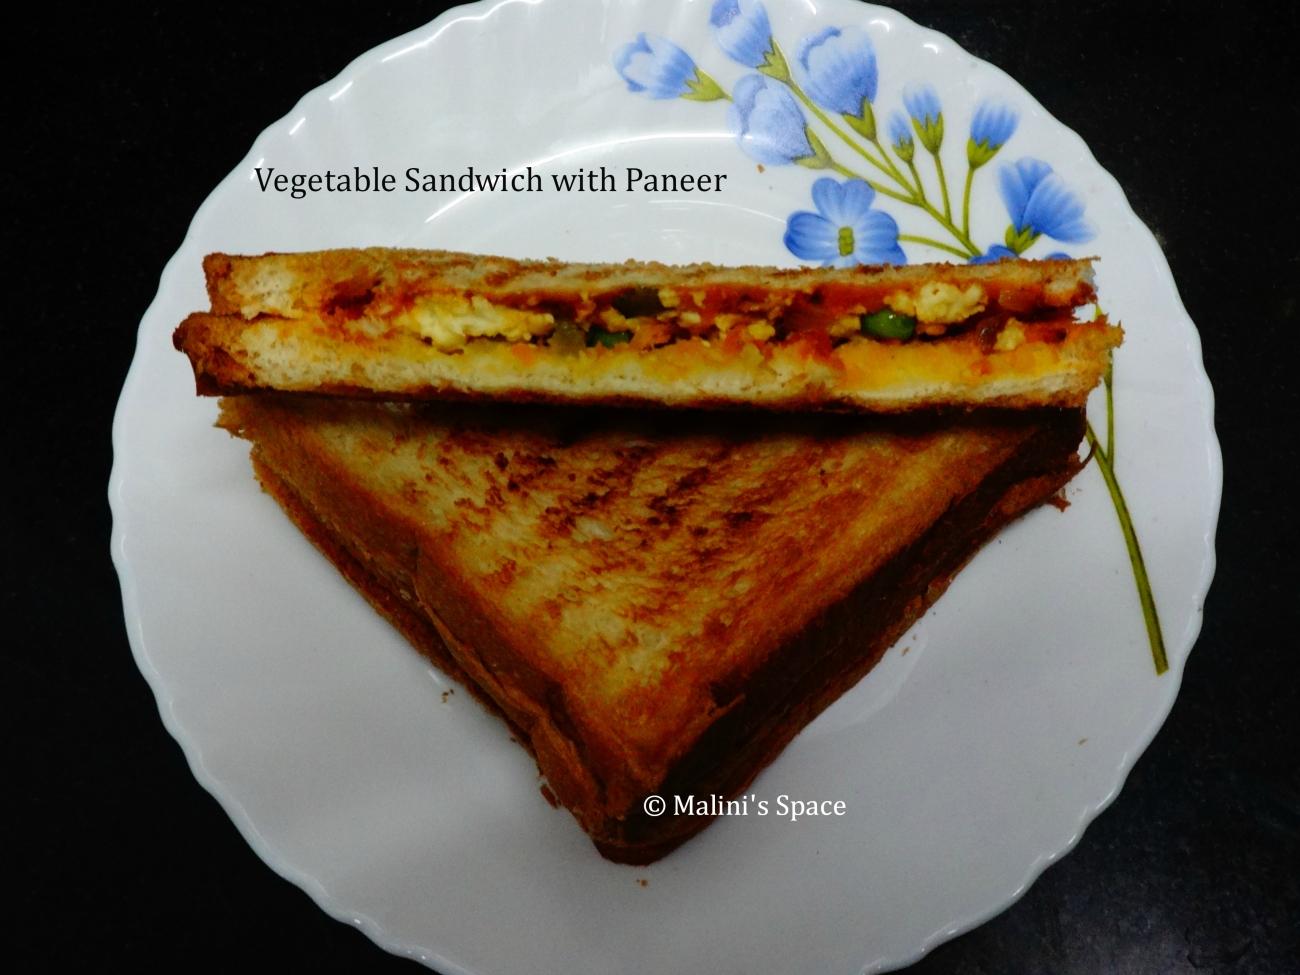 Vegetable Sandwich with Paneer